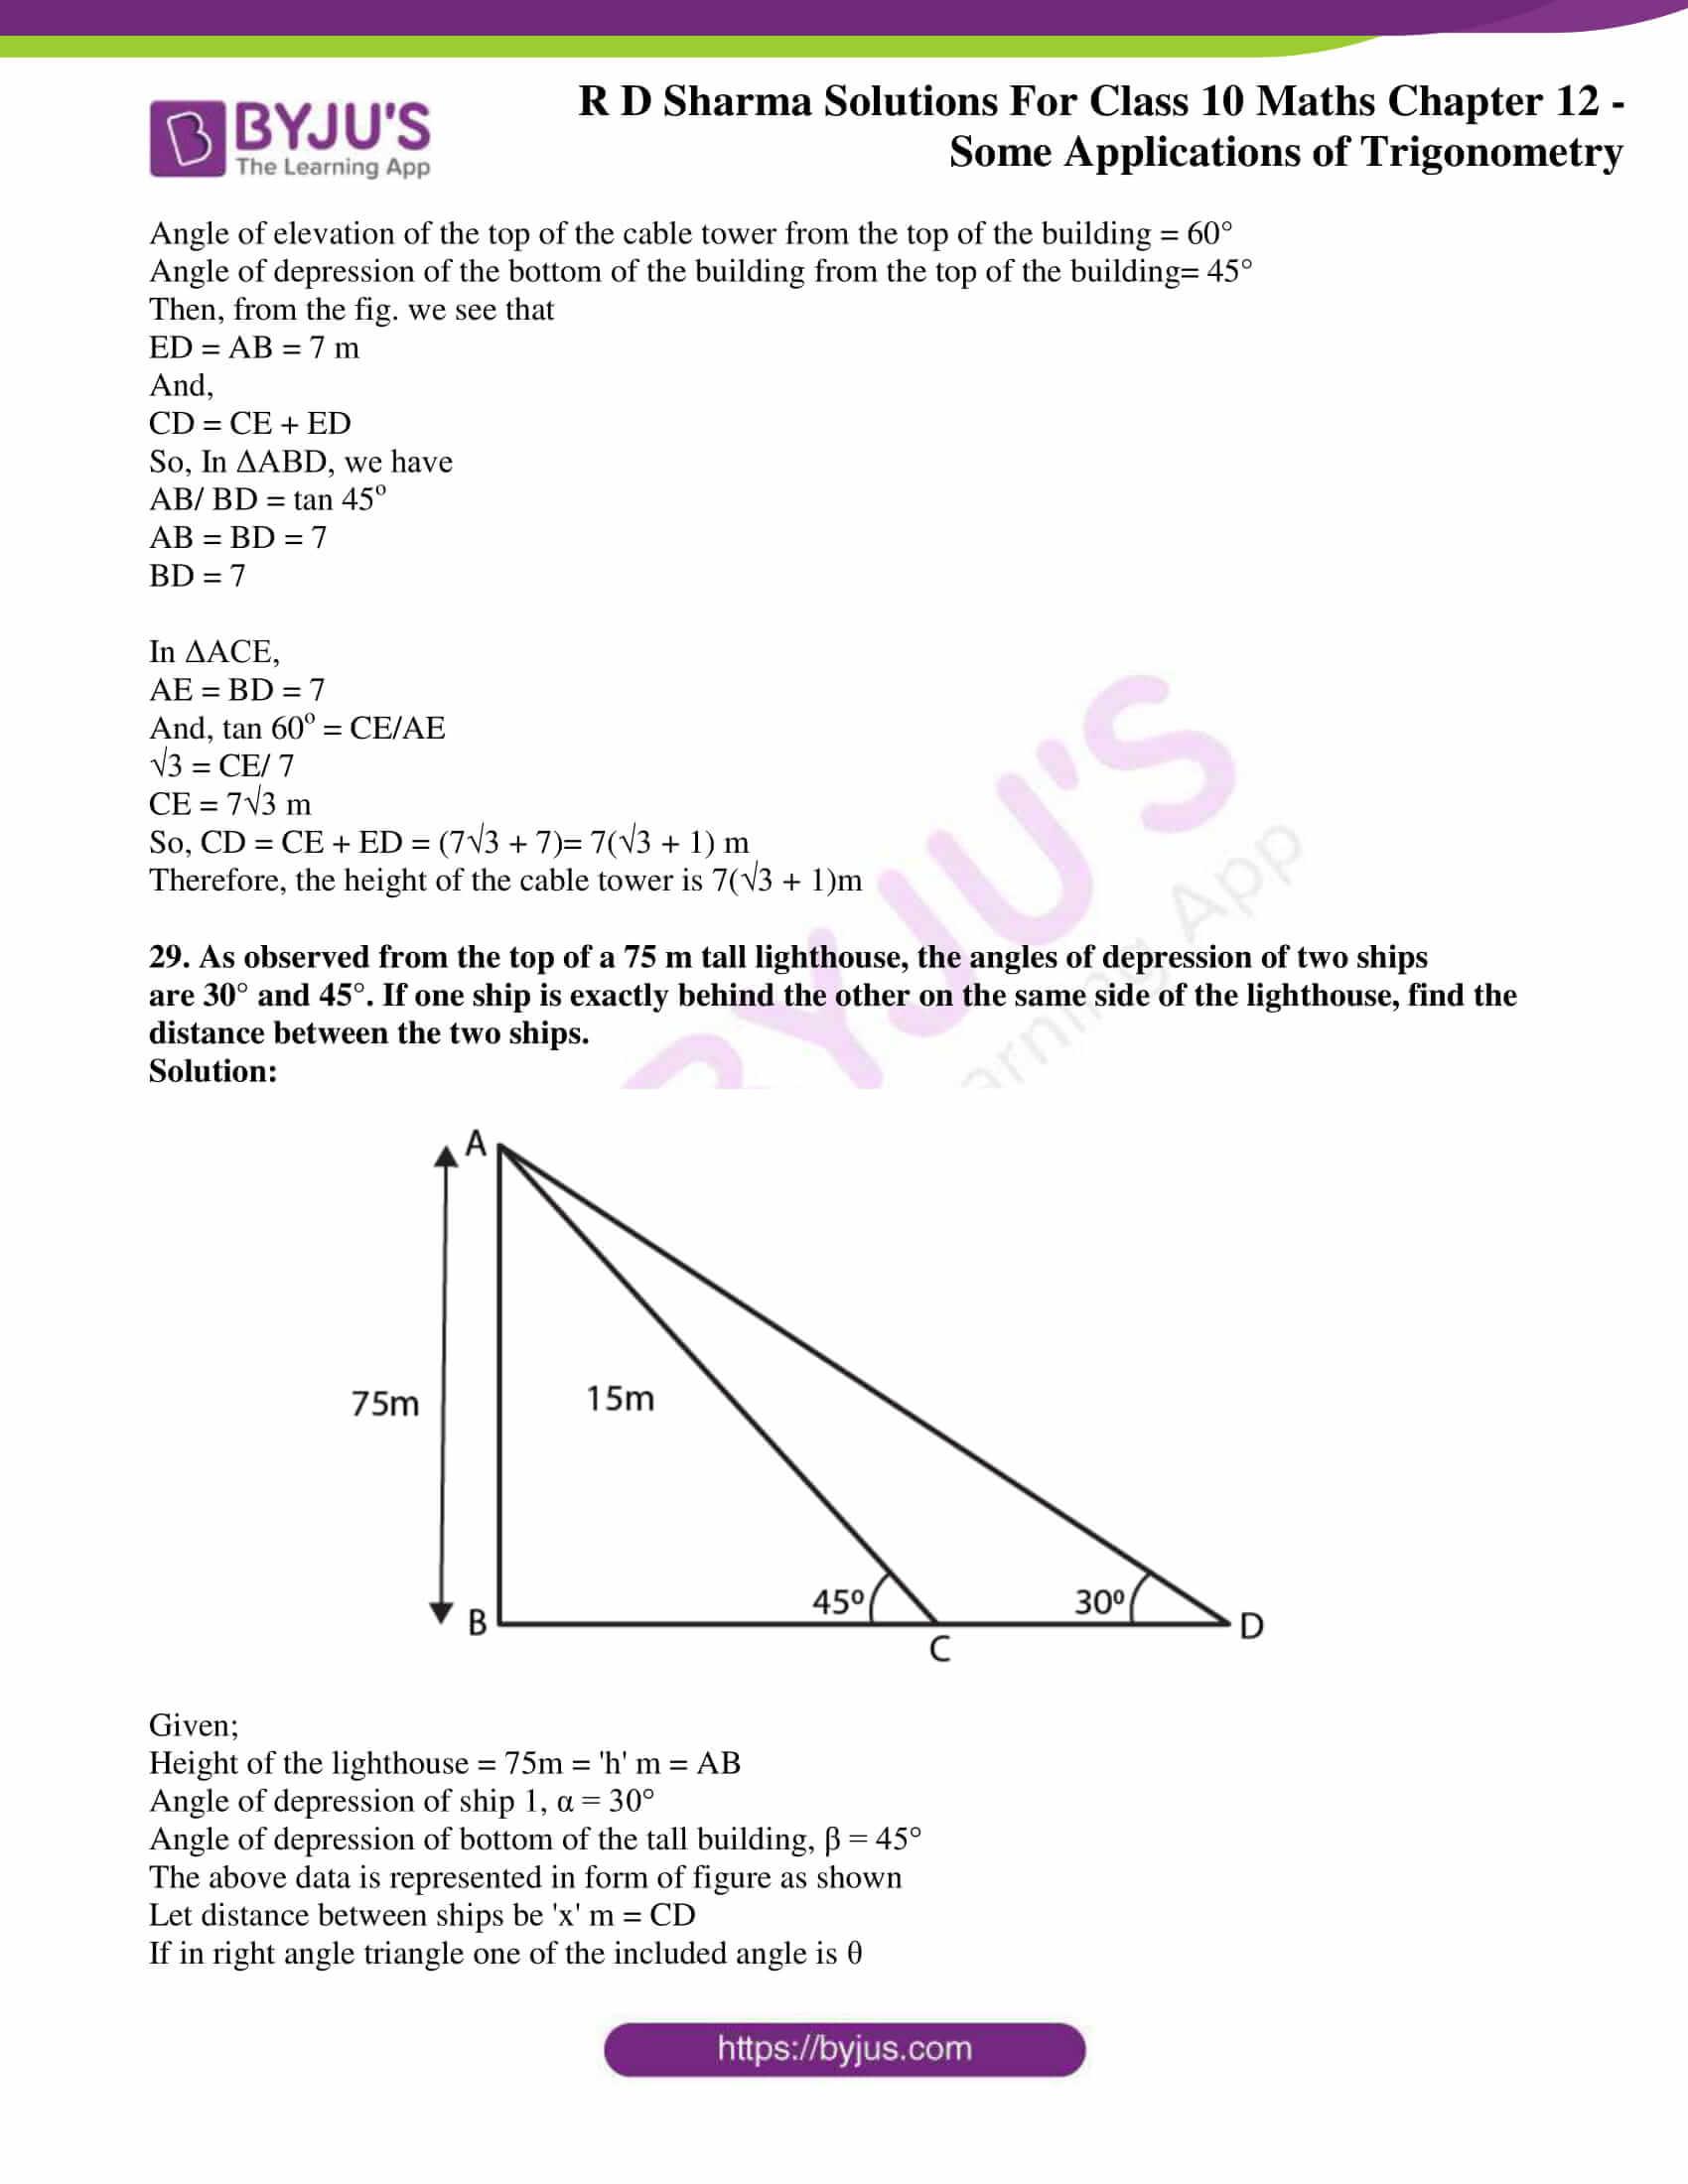 rd sharma class 10 chapter 12 applications trigonometry solutions 28